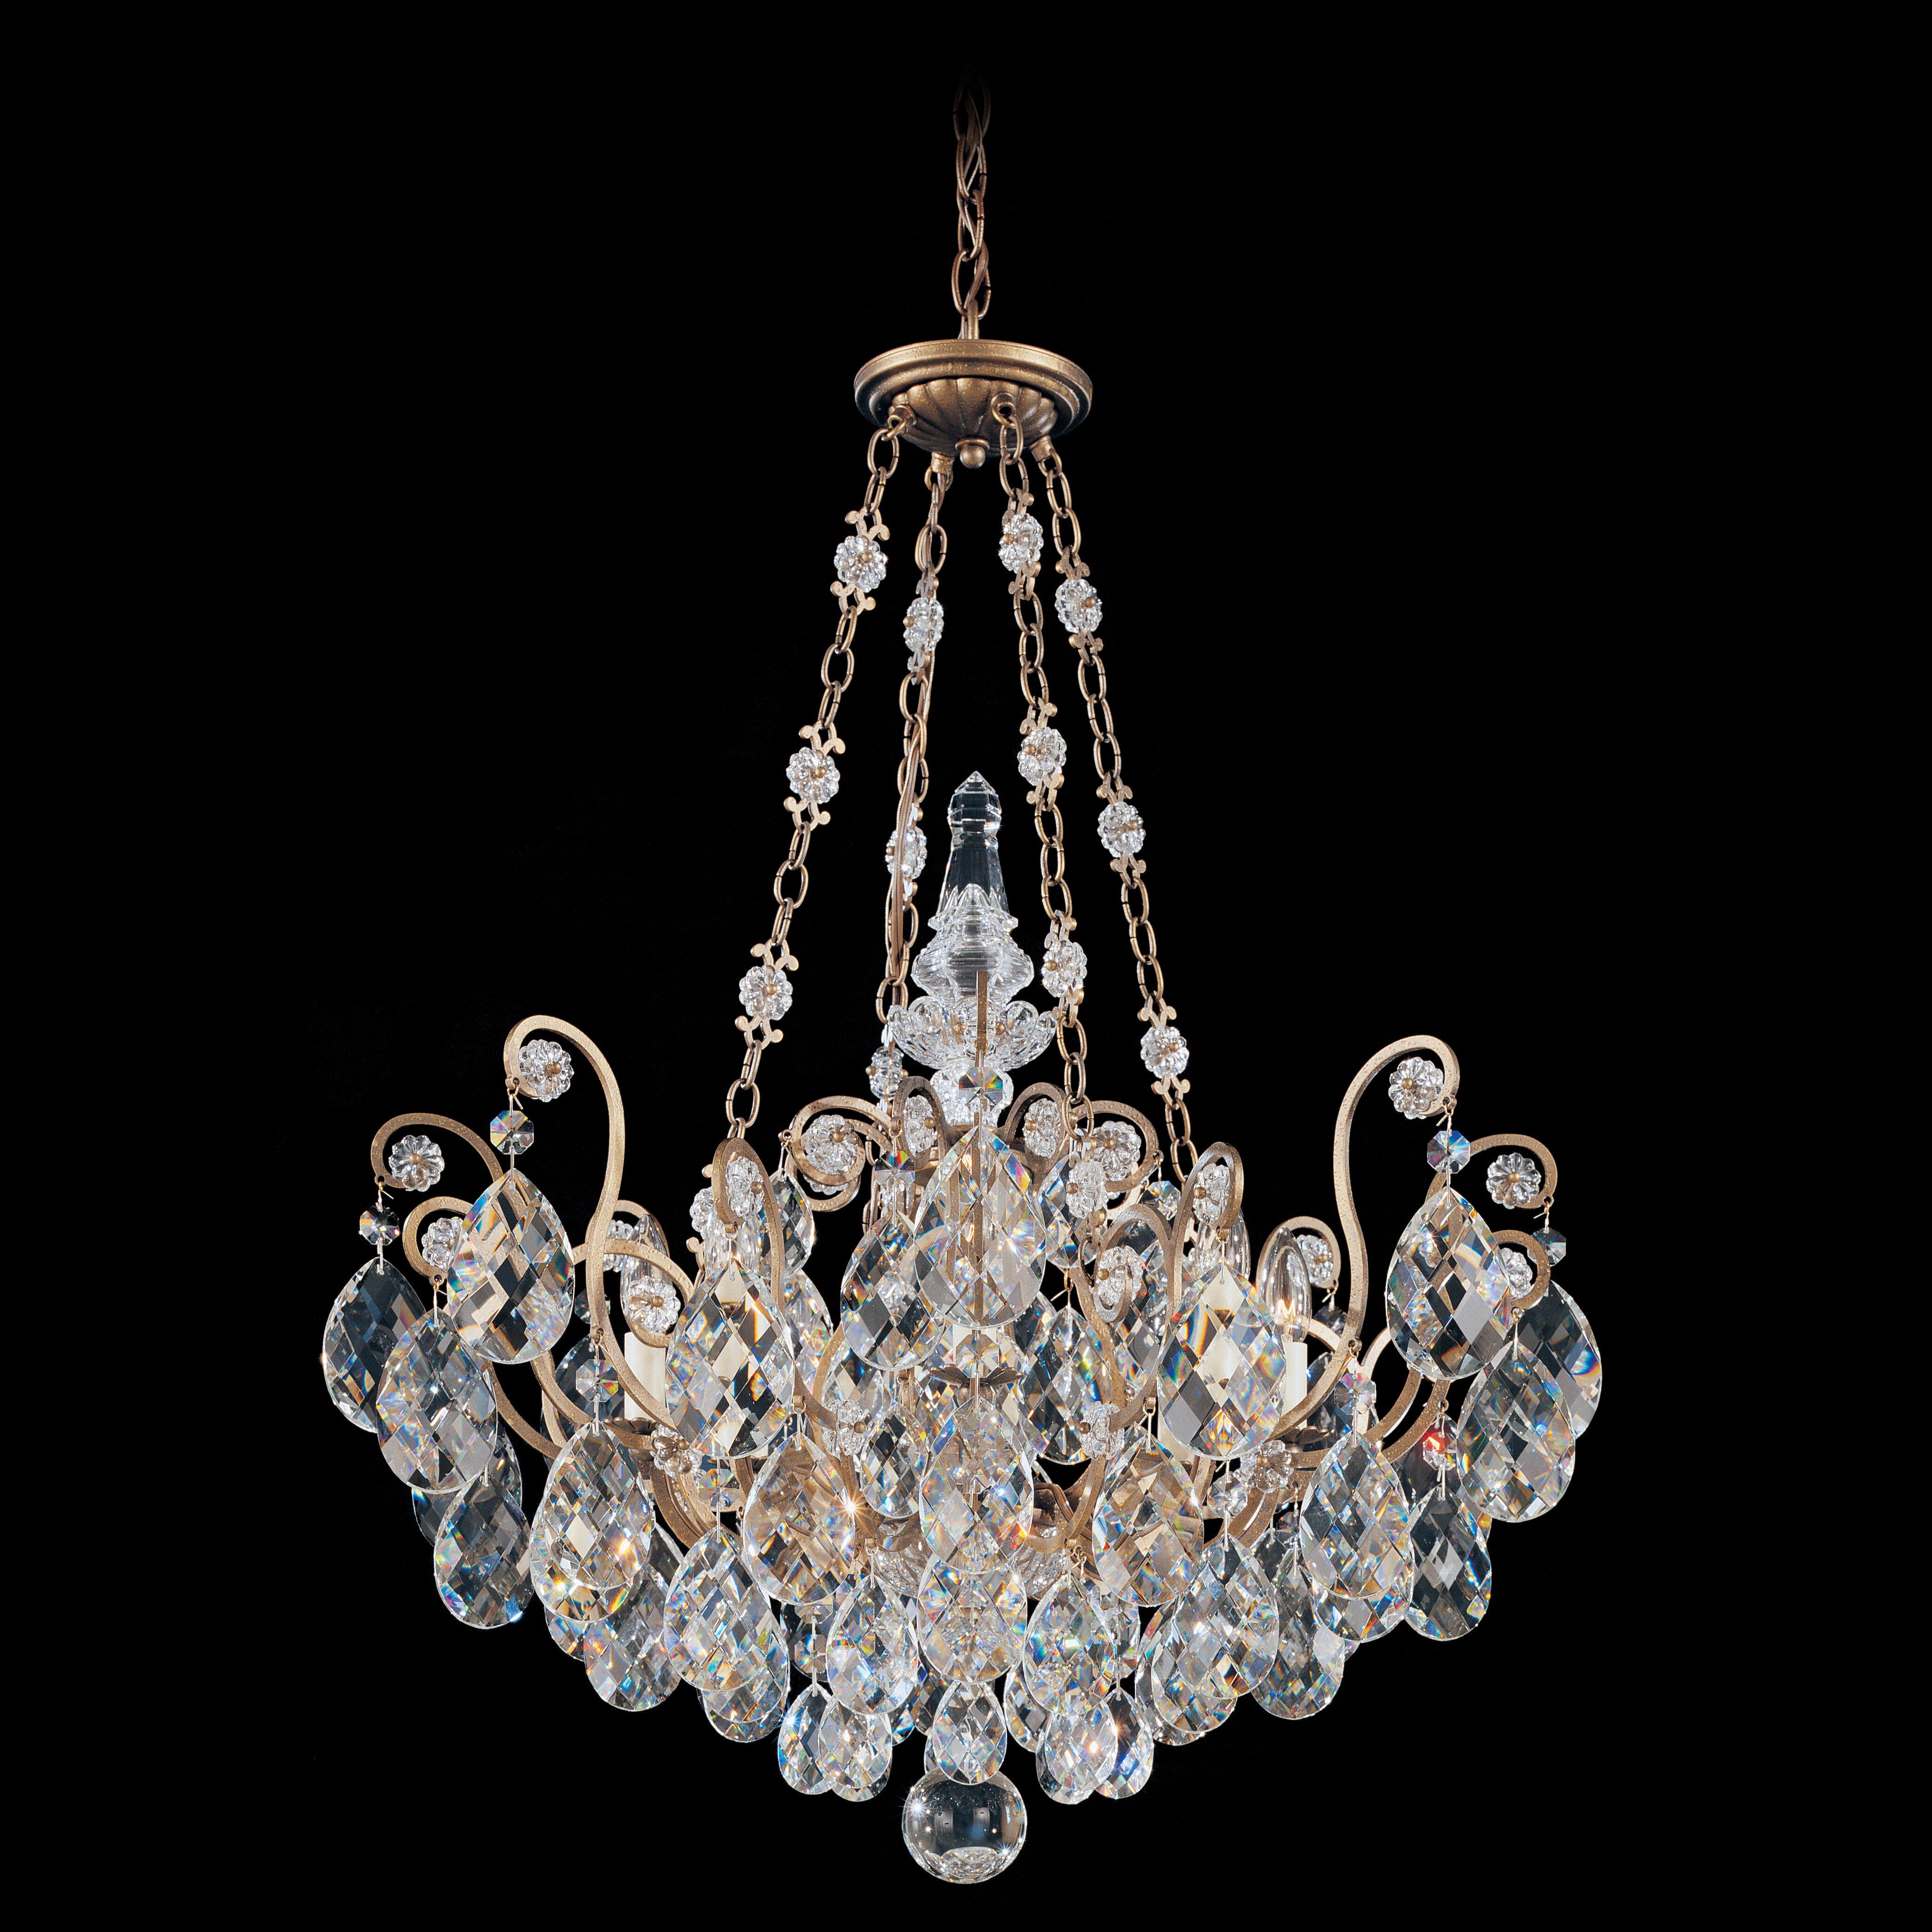 Schonbek Renaissance 8 Light Crystal Chandelier & Reviews